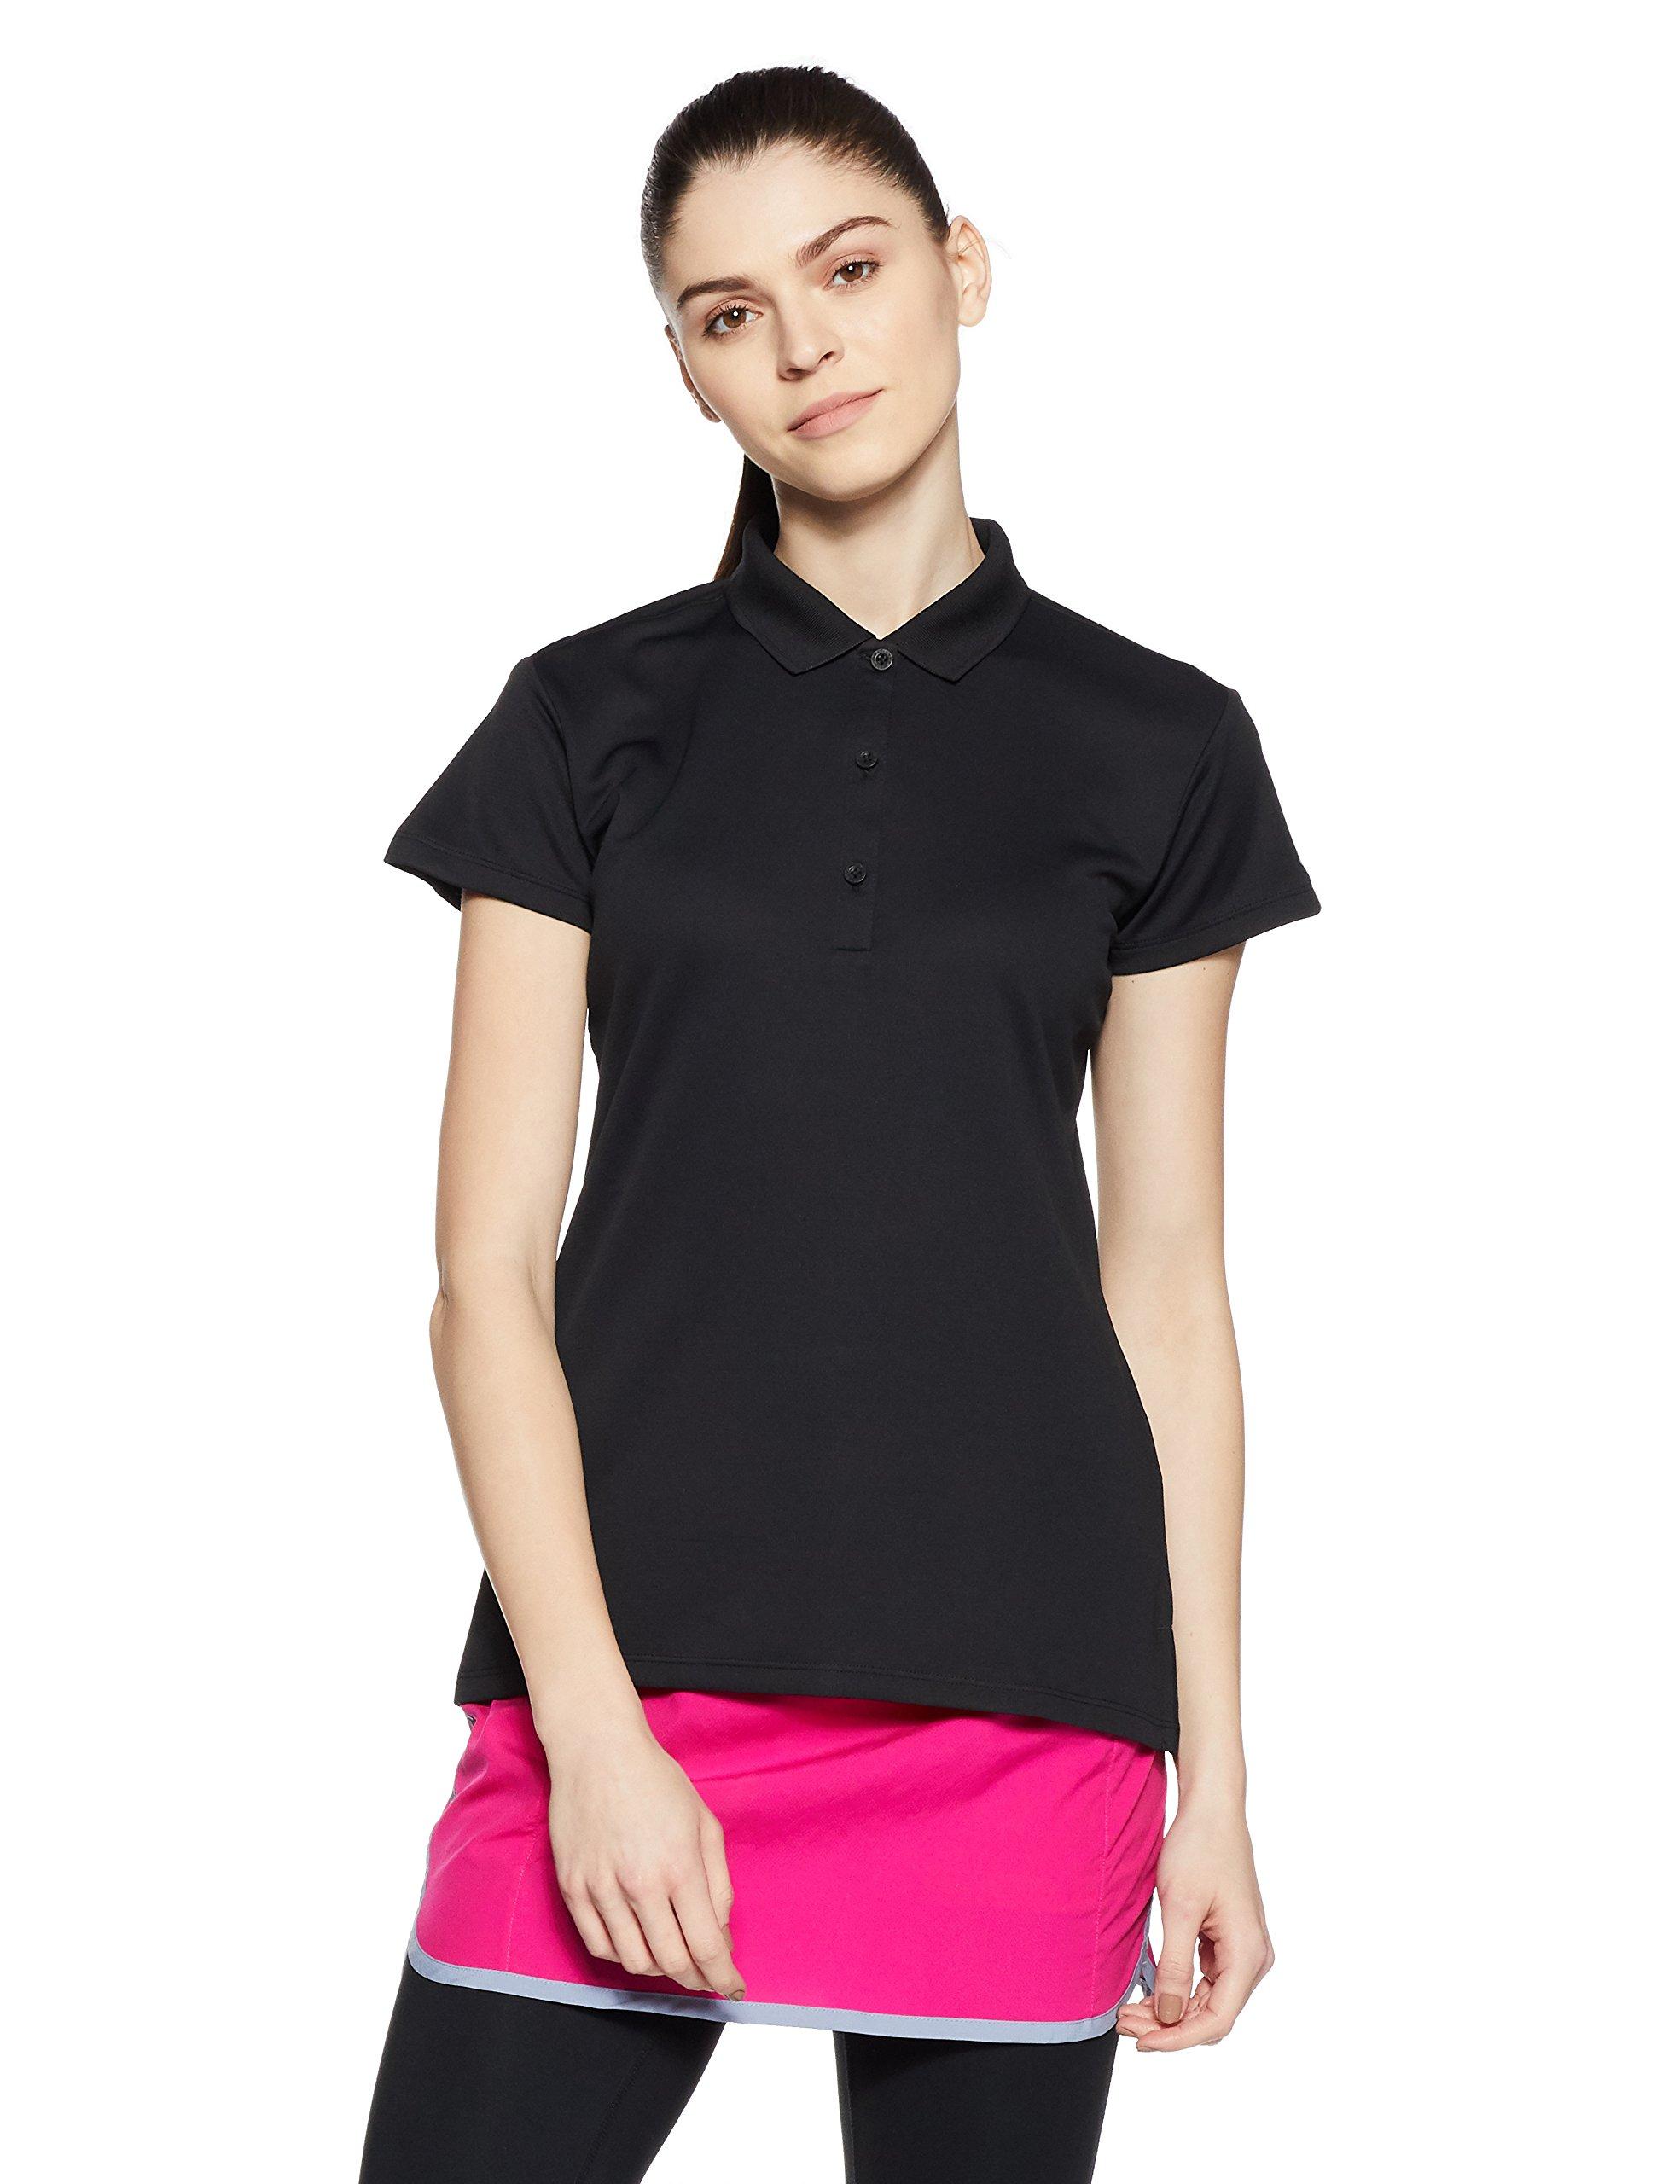 Columbia Women's Innisfree Short Sleeve Polo Shirt, Medium, Black